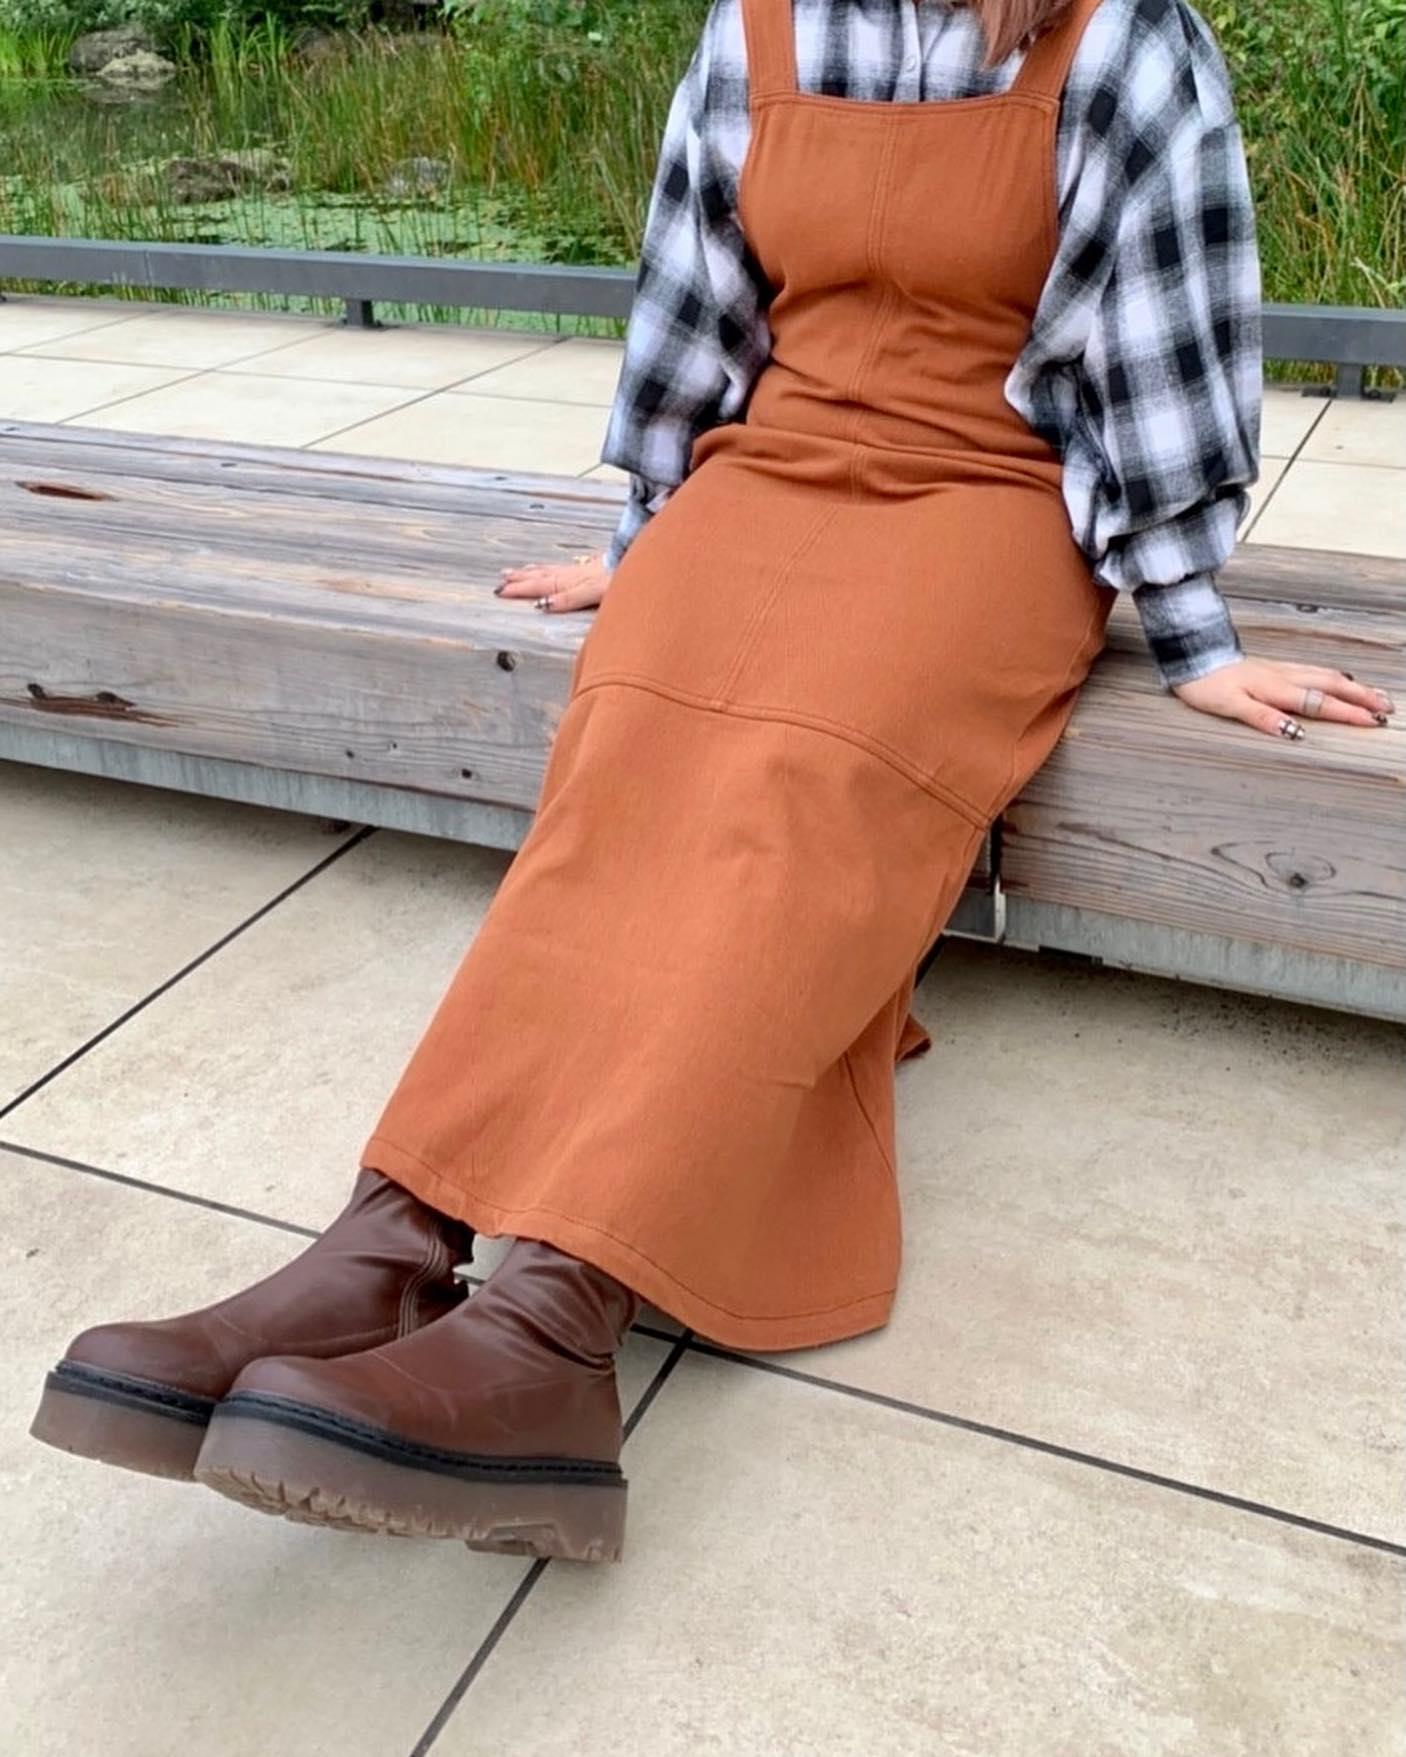 【New arrival】🏷 RF137522B002  マーメイドジャンスカワンピース▷¥4,290(税込)(店舗入荷中.オンライン近日入荷) ∥color∥ orange / beige / black#retrogirl_ootd#レトロガール#レトロガールコーデ#トレンドファッション#プチプラコーデ#秋カラー #秋コーデ #2021aw#マーメイドスカート #マーメイドワンピース